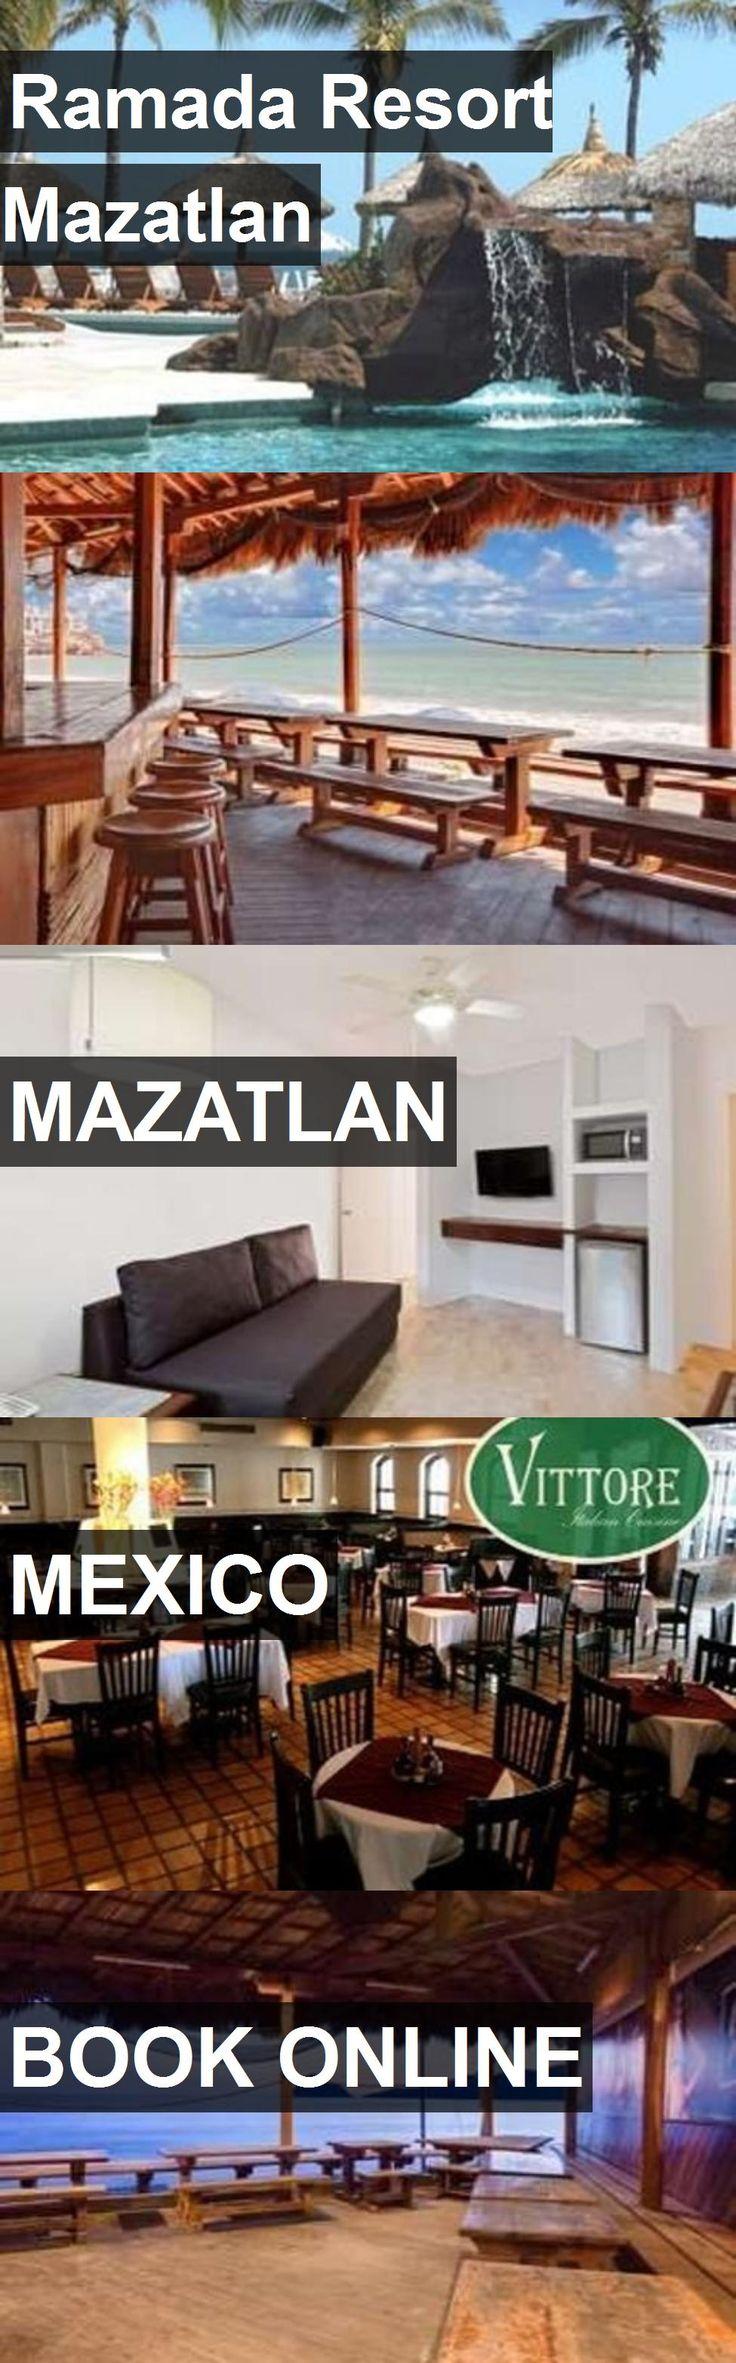 Hotel Ramada Resort Mazatlan in Mazatlan, Mexico. For more information, photos, reviews and best prices please follow the link. #Mexico #Mazatlan #travel #vacation #hotel